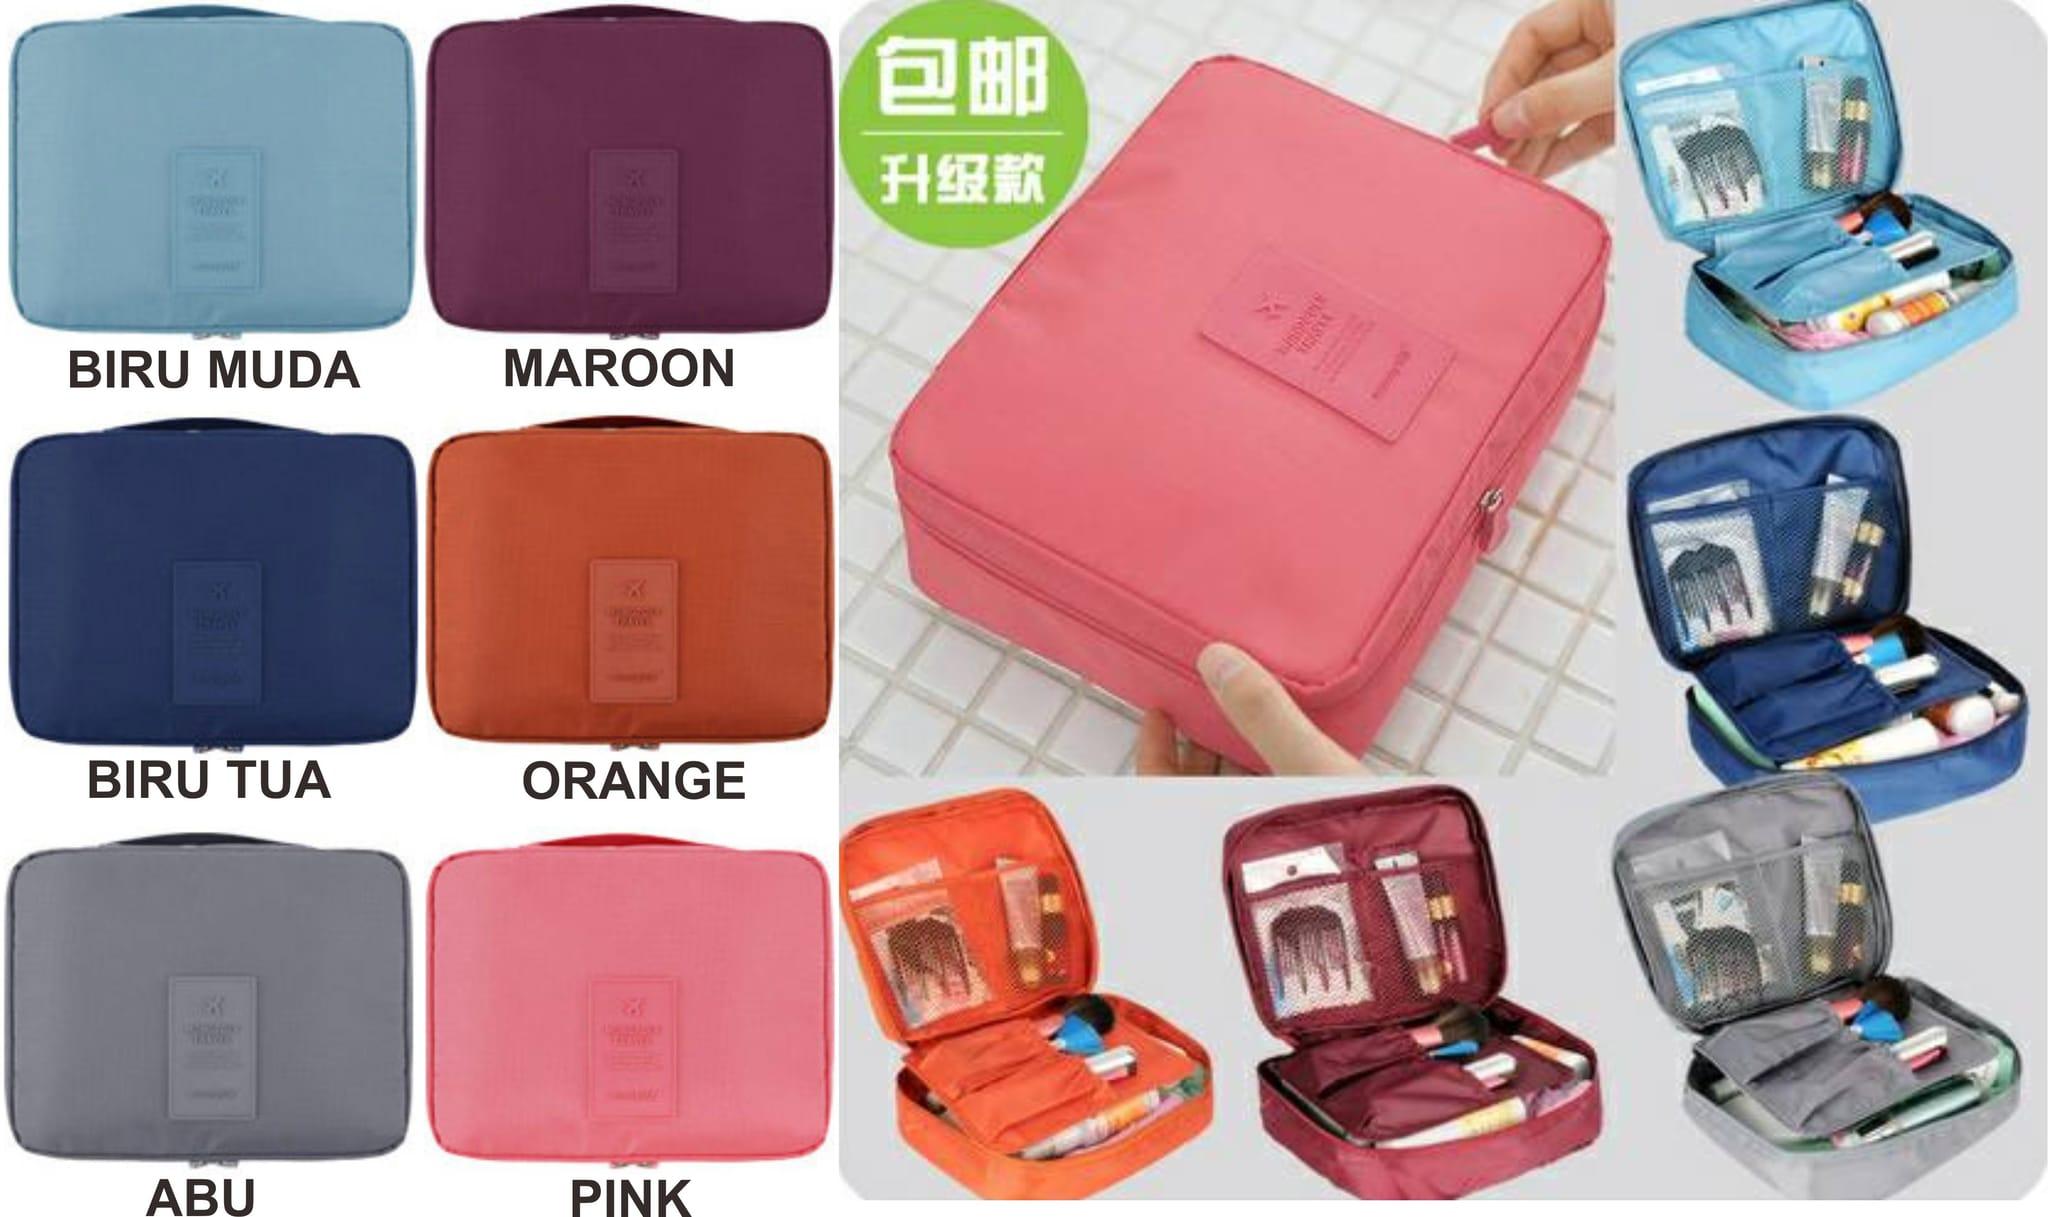 ... Kosmetik Organizer Cosmetic Monopoly Pouch A316 Jc 1331. Source · 16254965_db57eef4-a4be-4cf6-ab5b-57c262738161_2048_1217.jpg